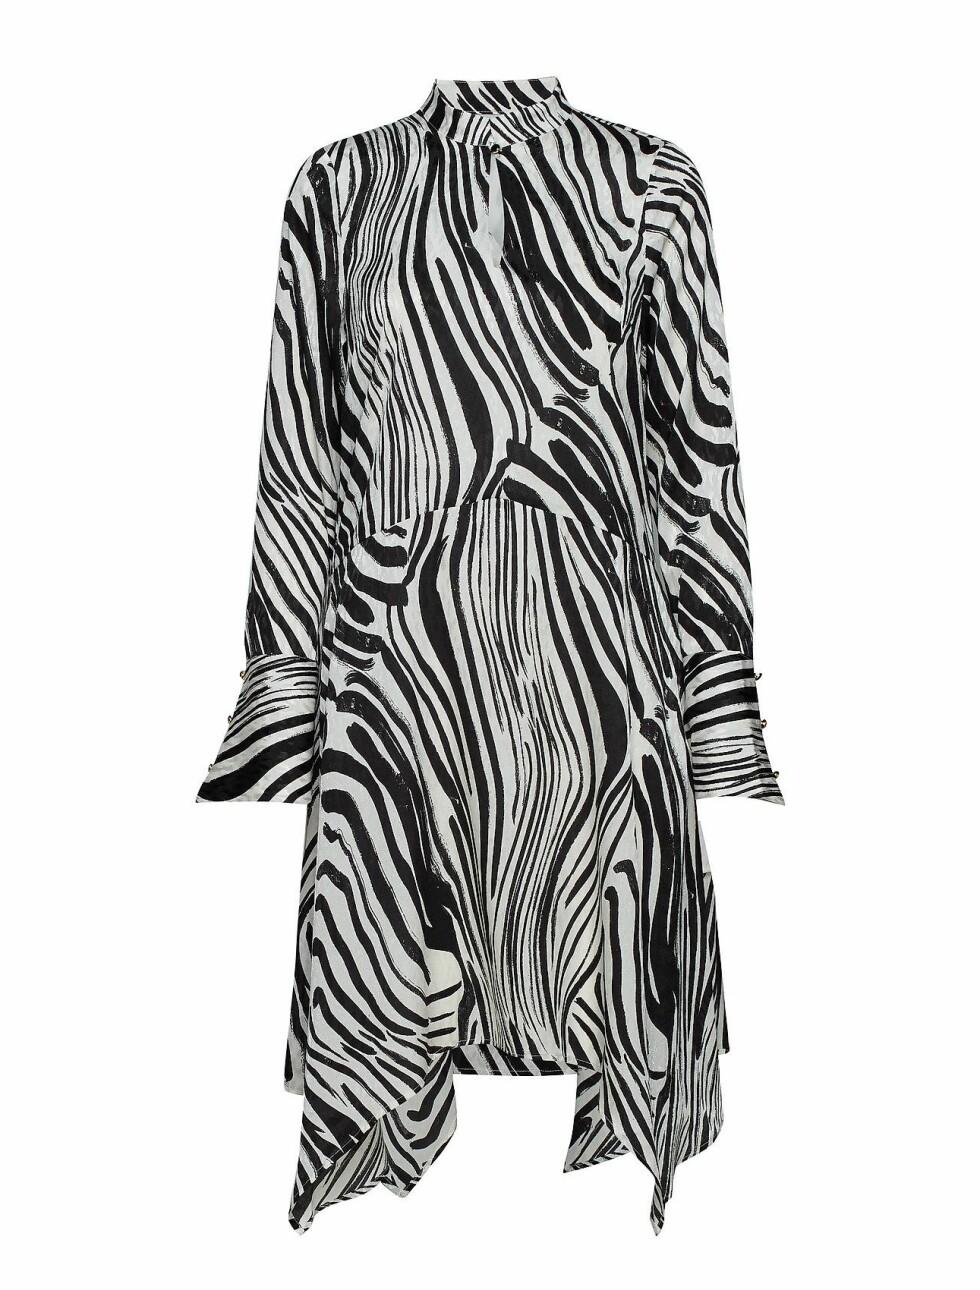 Kjole fra Gestuz |1800,-| https://www.boozt.com/no/no/gestuz/siwra-dress-so19_18644816/18644824?path=67362&navId=67362&sNavId=67378&group=listing&position=1000000